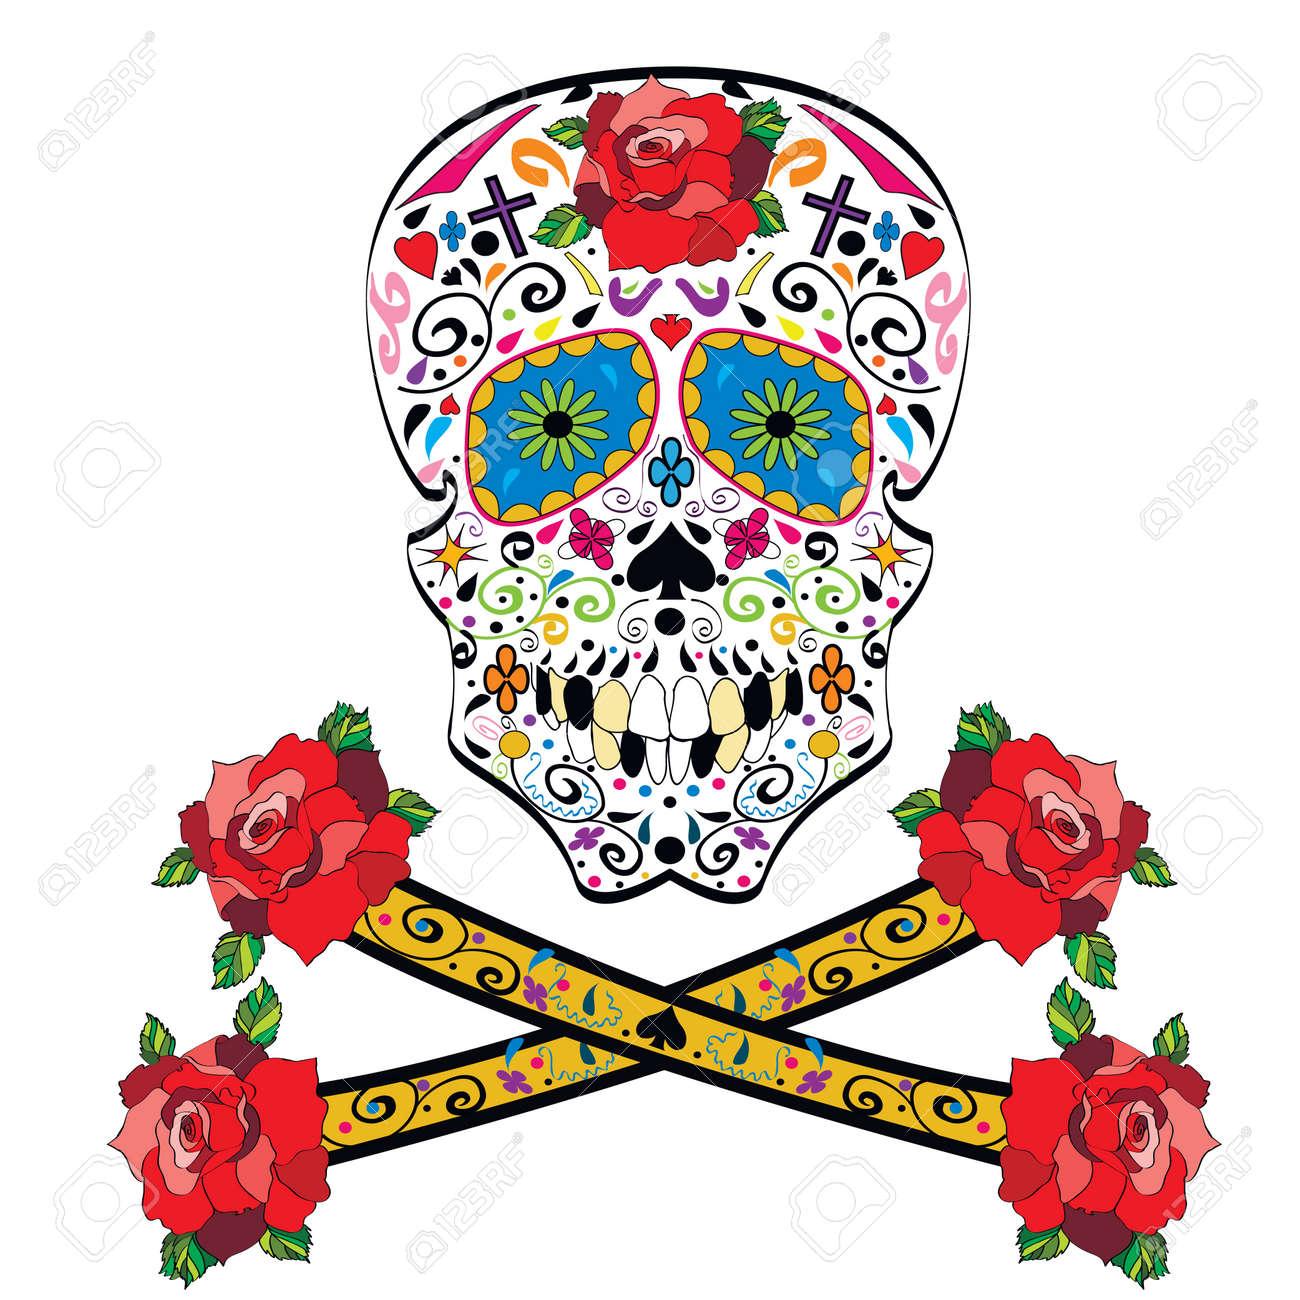 Sugar skull illustration on white background - 29985385